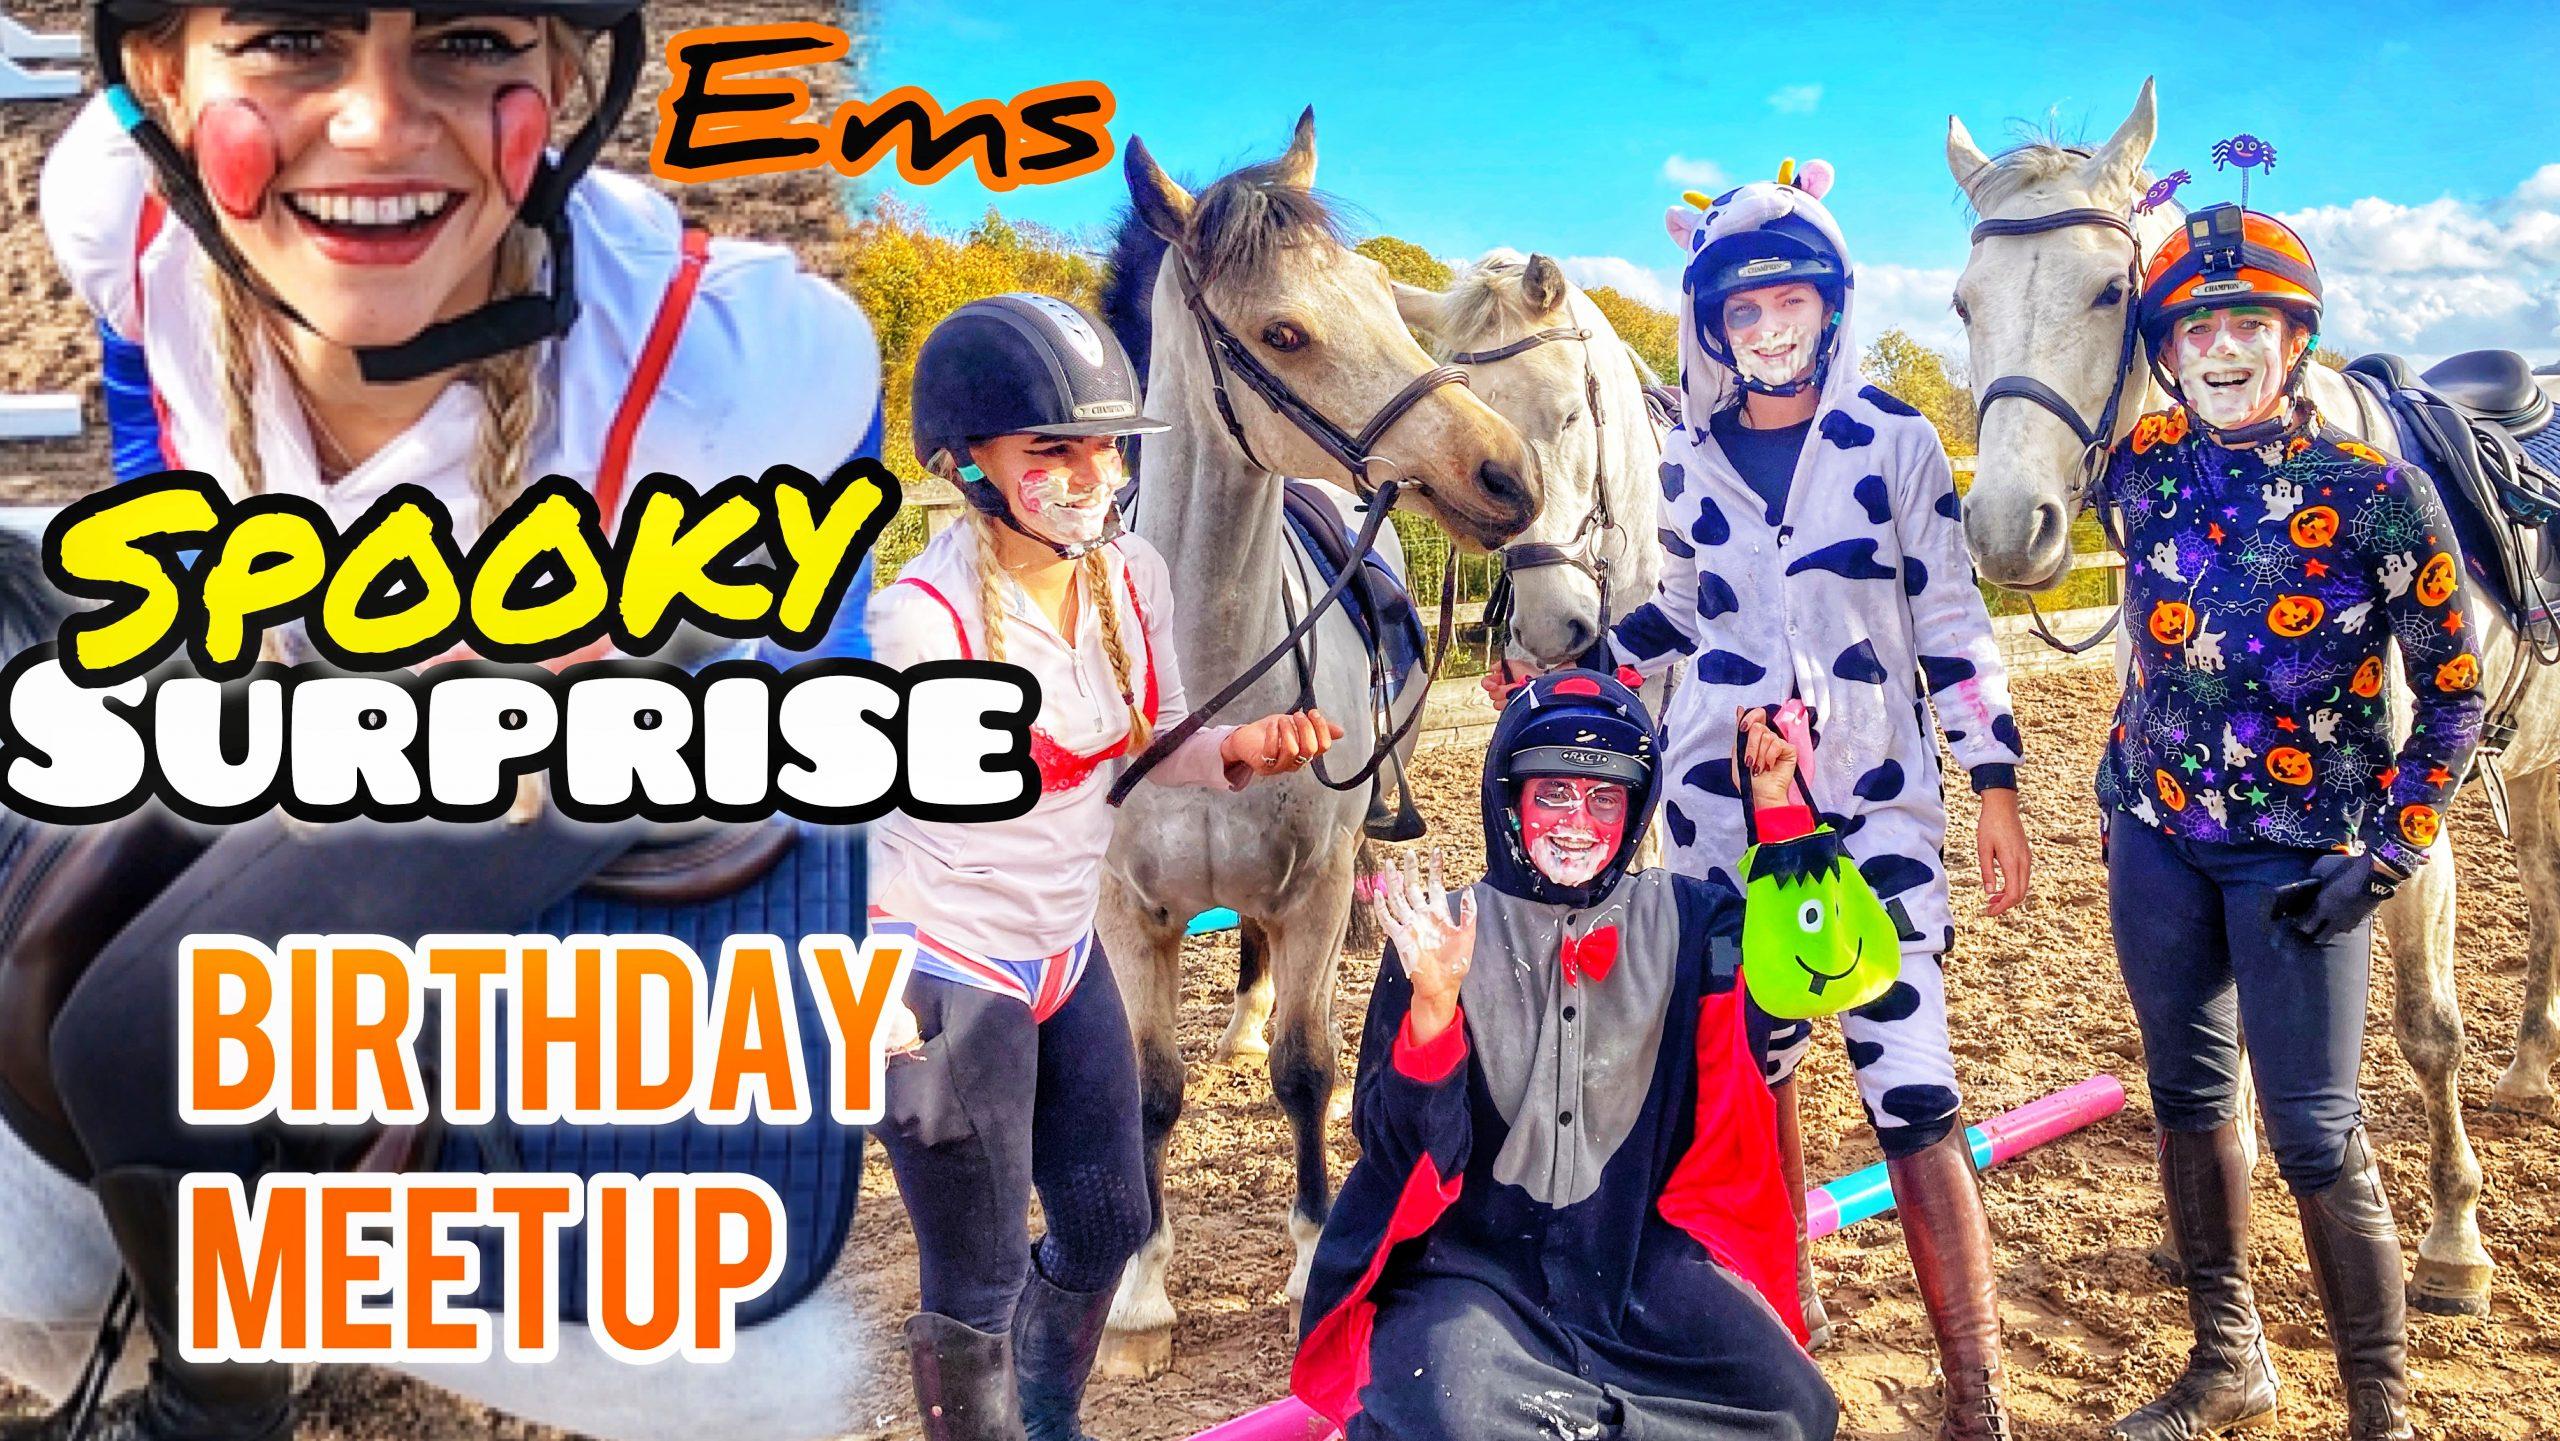 VESQUAD EMS BIRTHDAY MEET UP | Jumping Megs Ponies 🦄 Halloween Games 👻